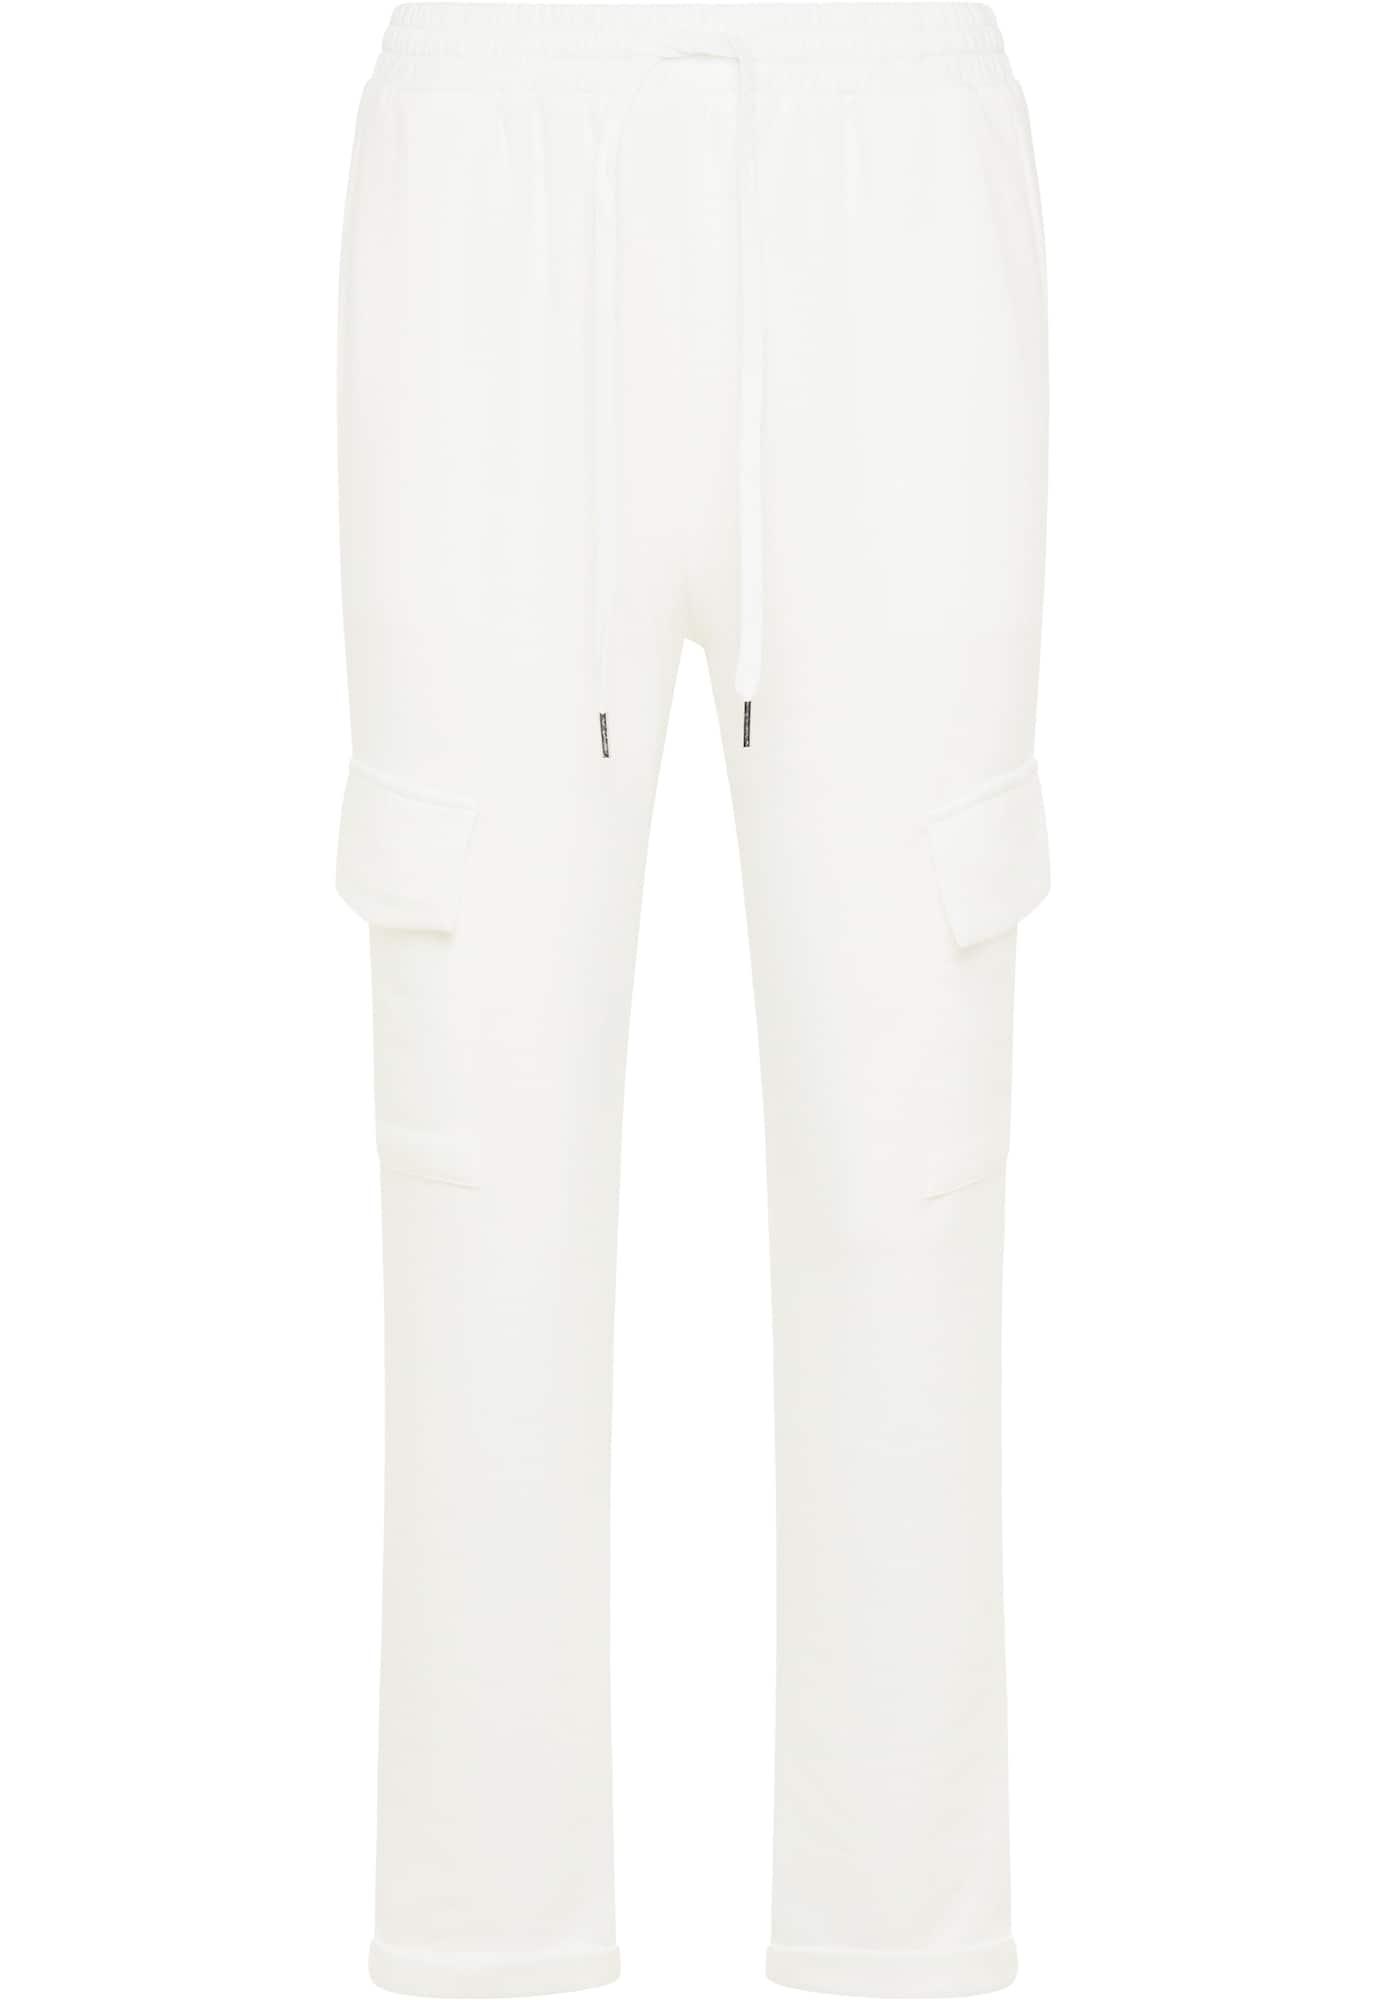 usha BLUE LABEL Laisvo stiliaus kelnės balta